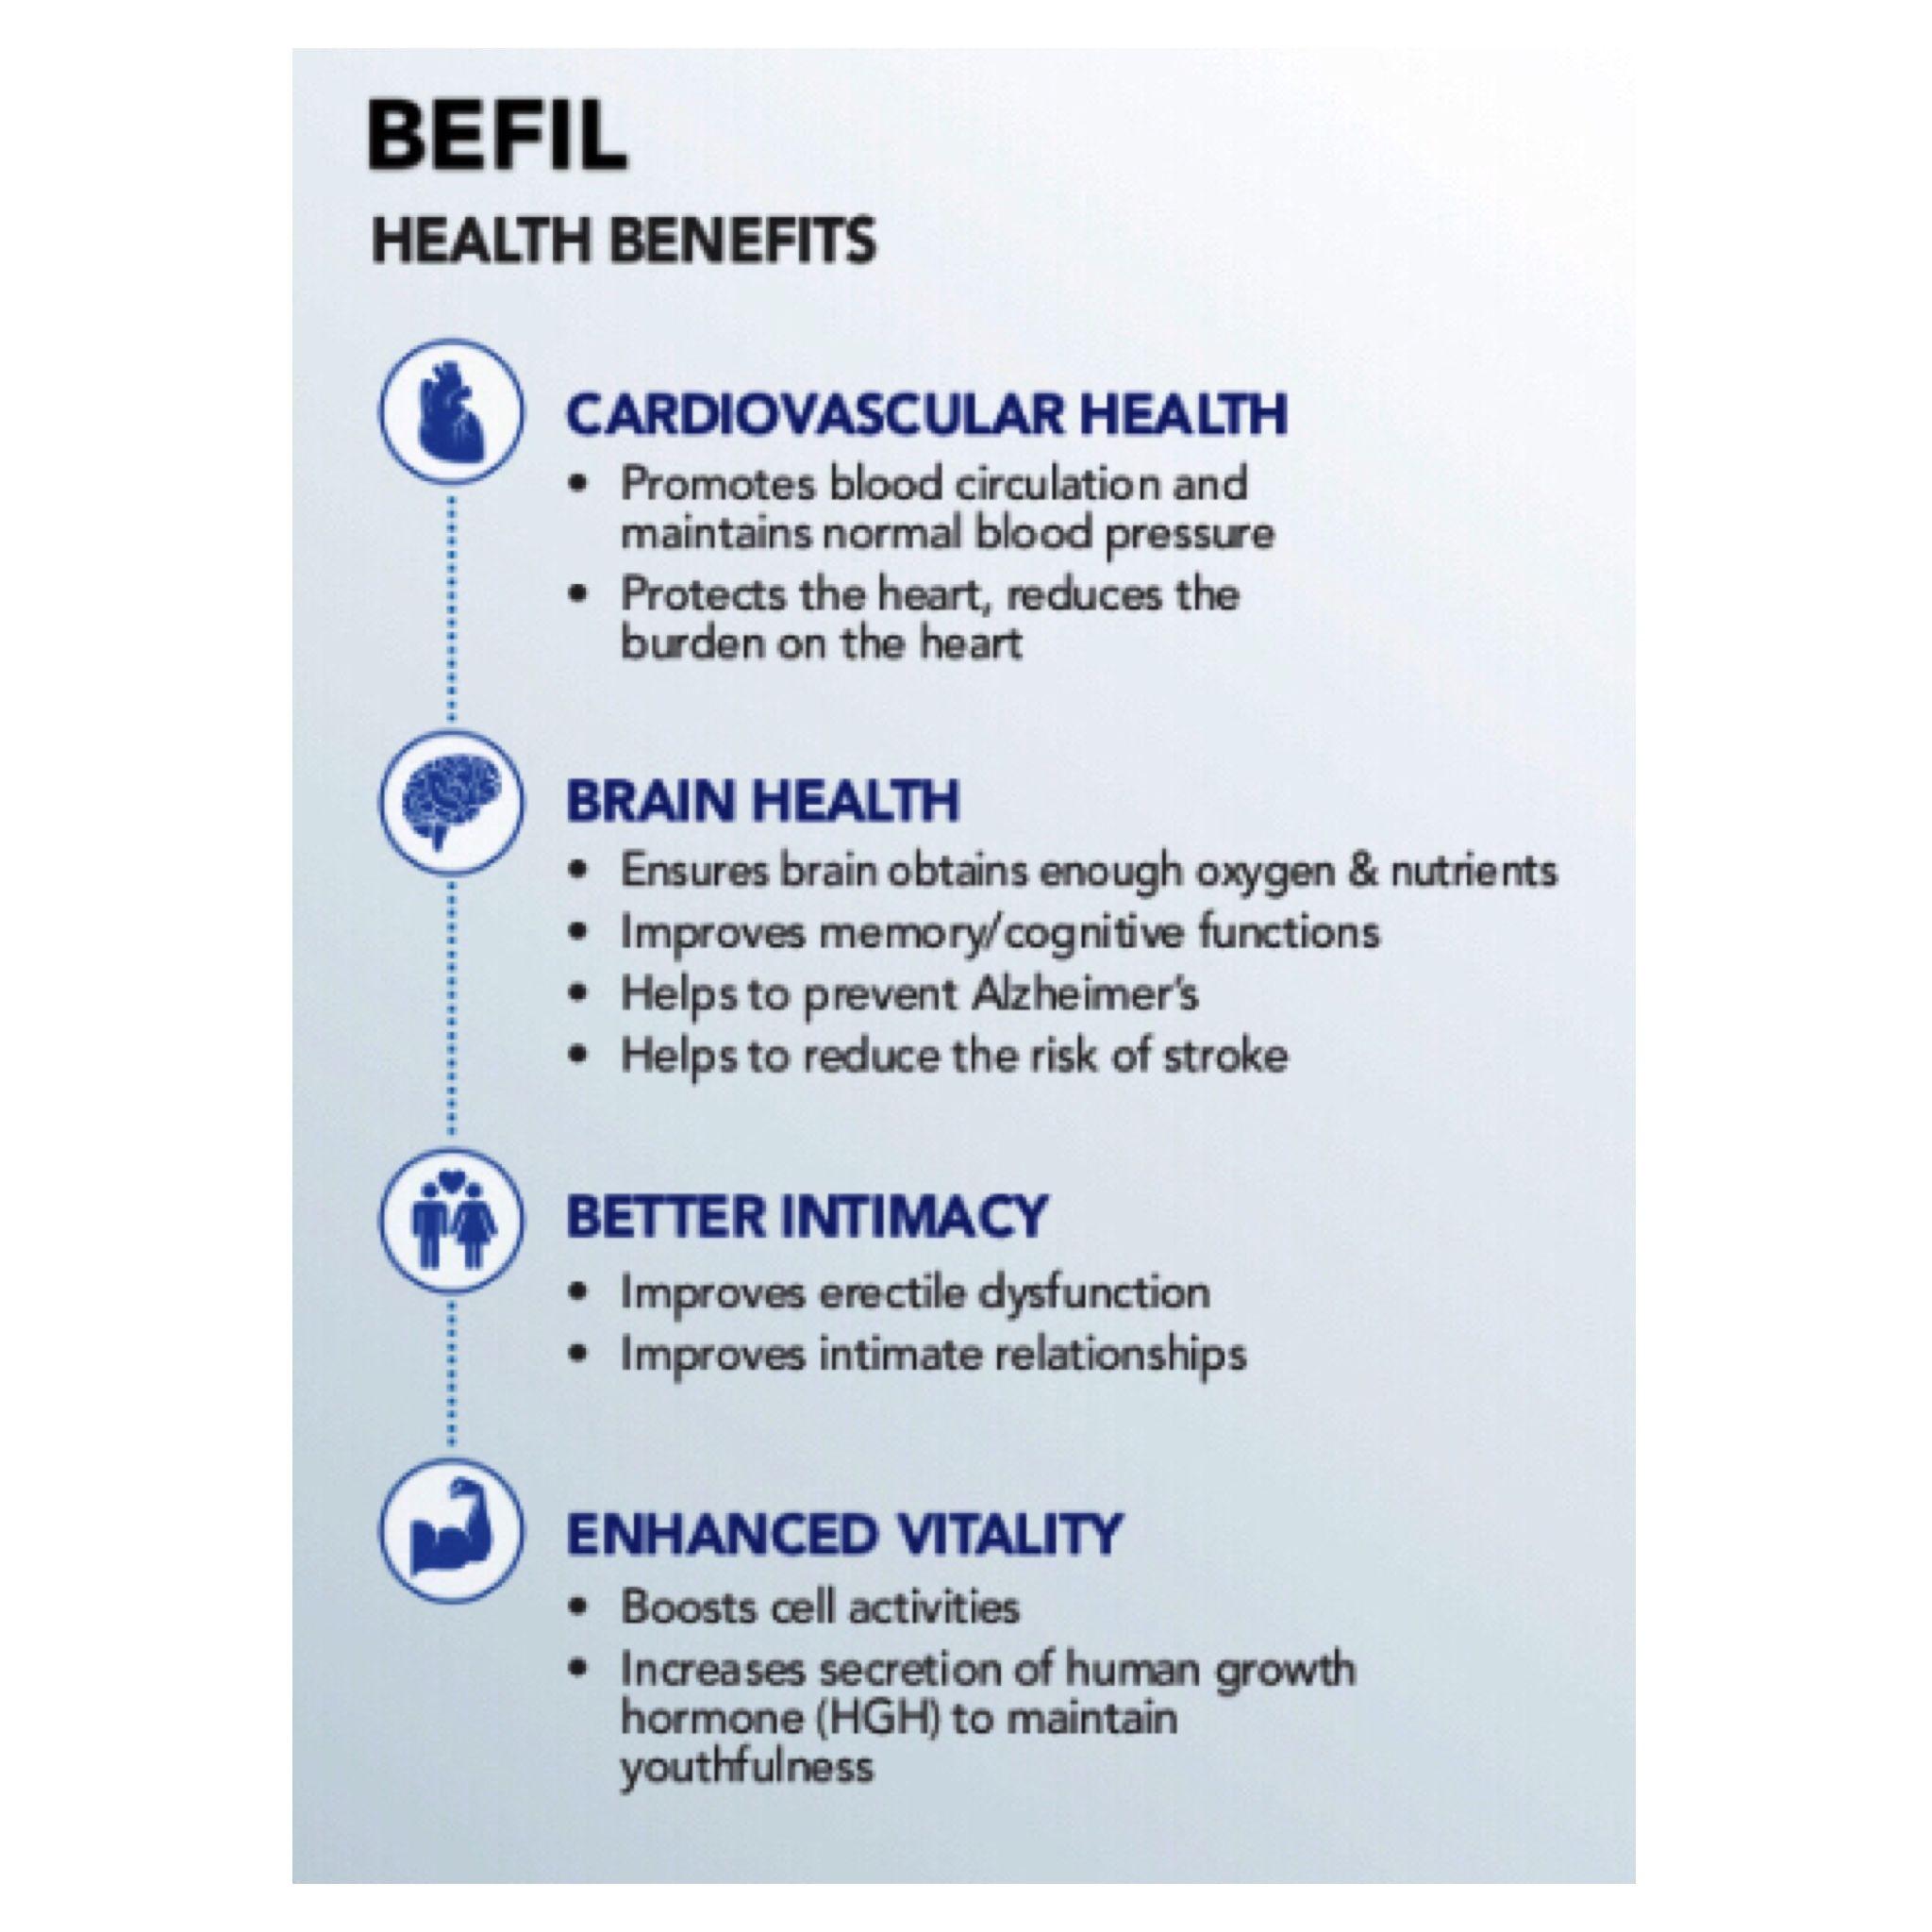 Pin by Jane Lim on BEFIL Improve memory, Brain health